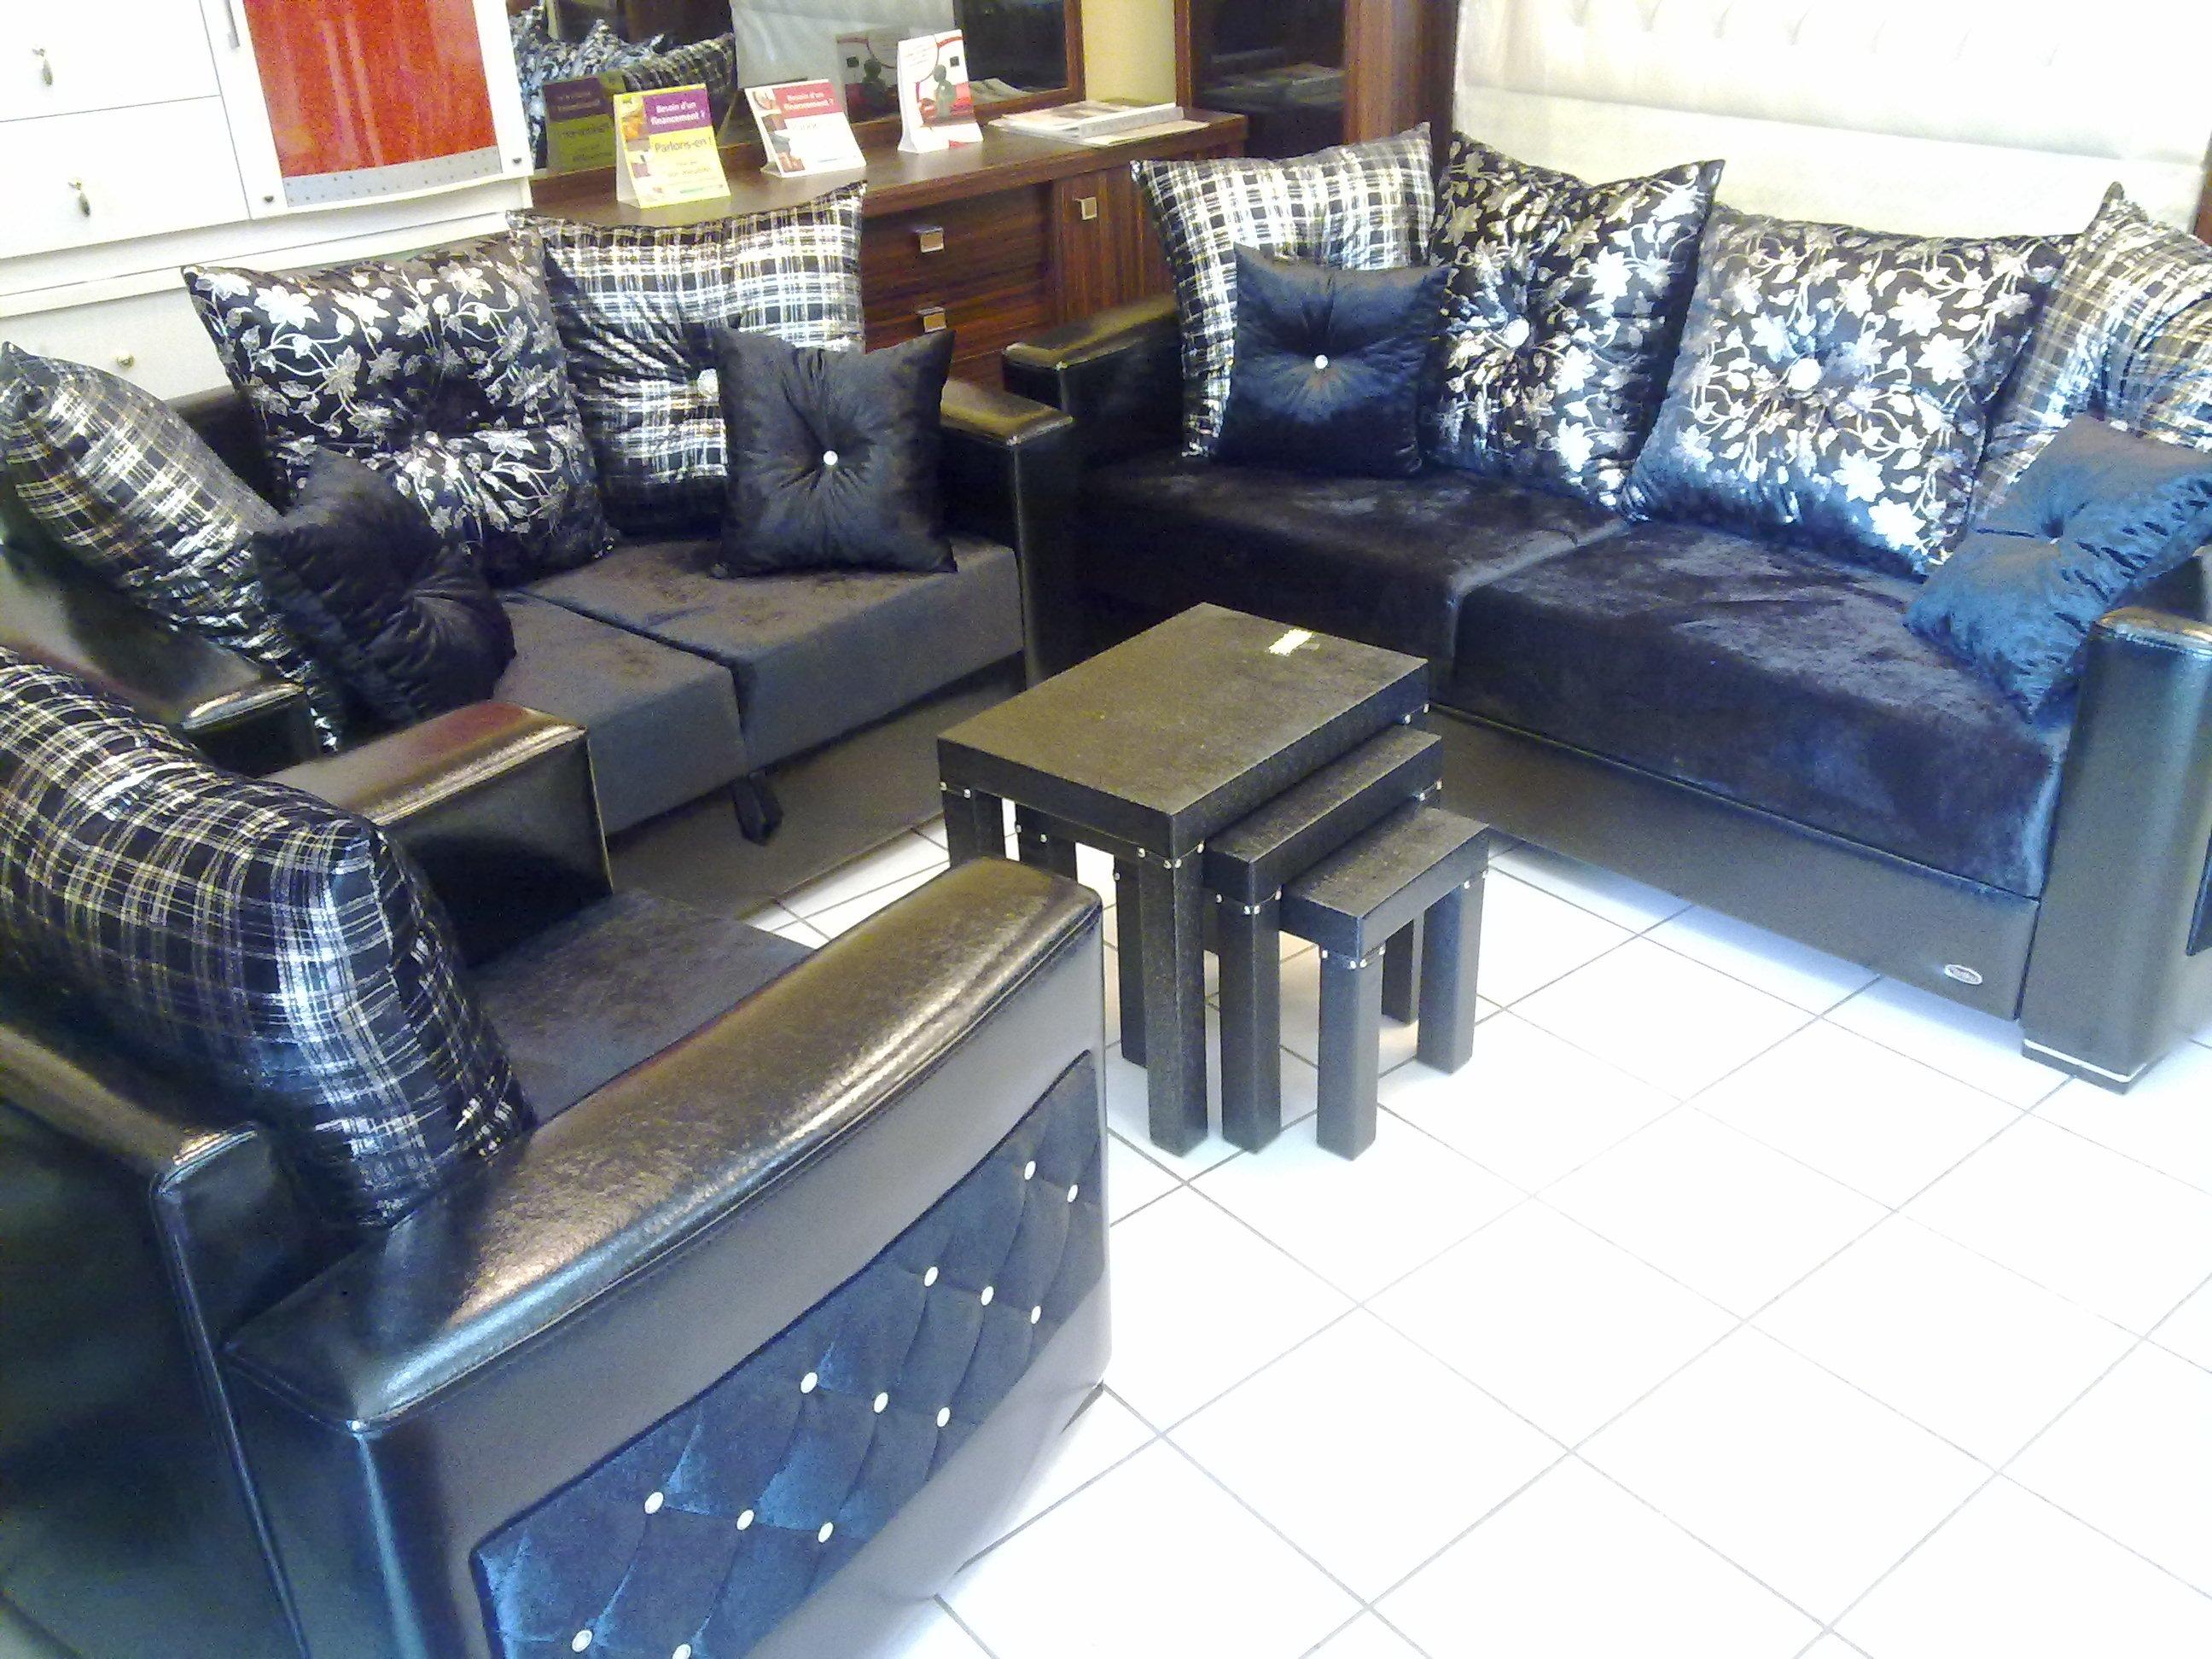 salons meubles salons literies tapis en ile de france. Black Bedroom Furniture Sets. Home Design Ideas